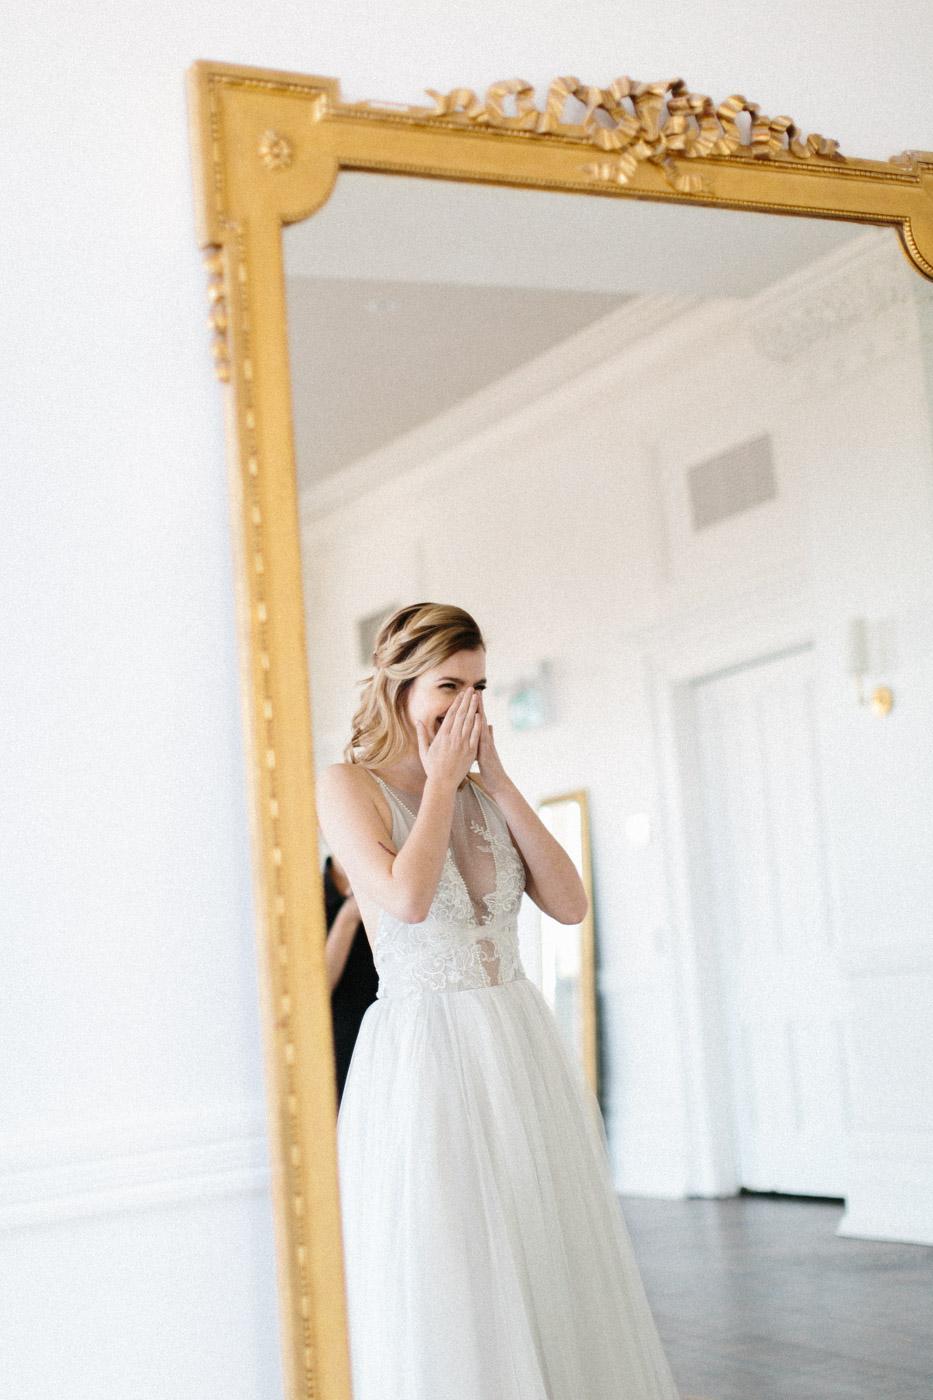 the_great_hall_wedding_photos 2017-270.jpg